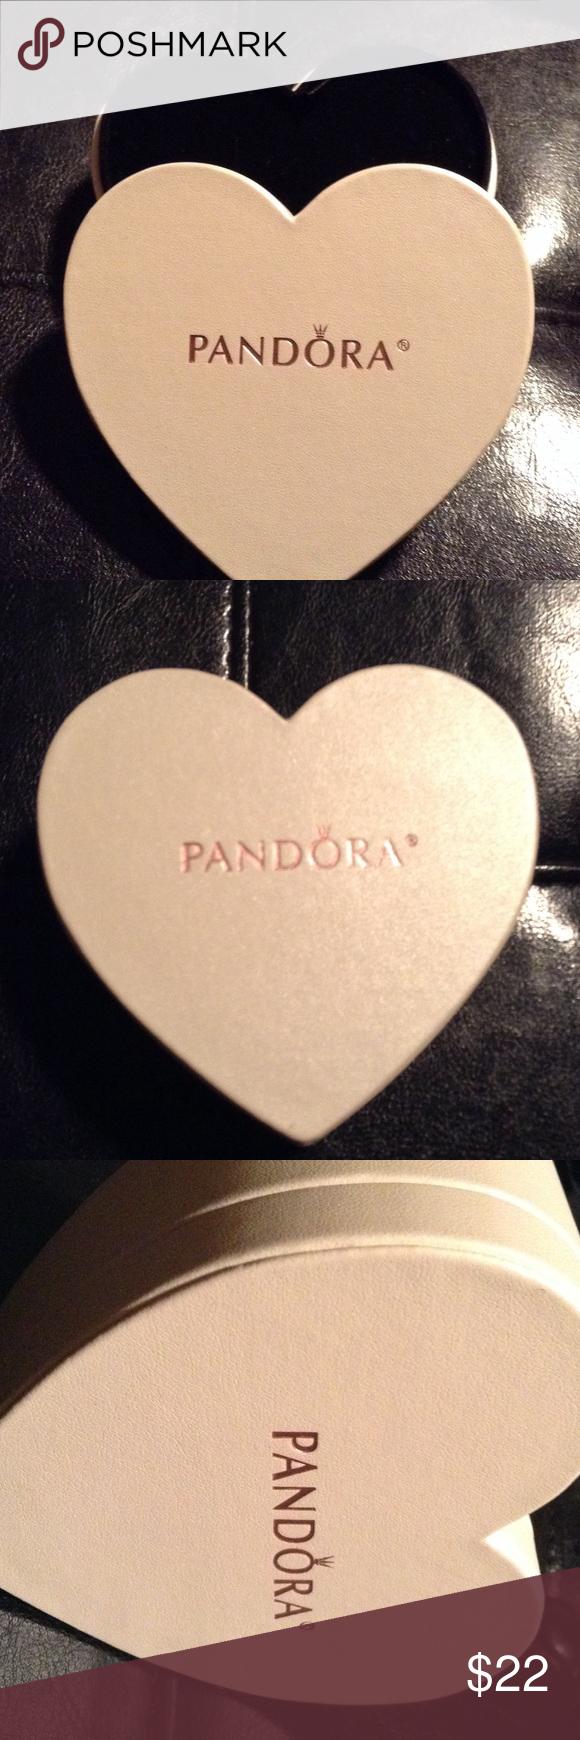 Pandora Heart Shaped Jewelry Box Heart Shaped Jewelry Pandora Jewelry Box Pandora Heart